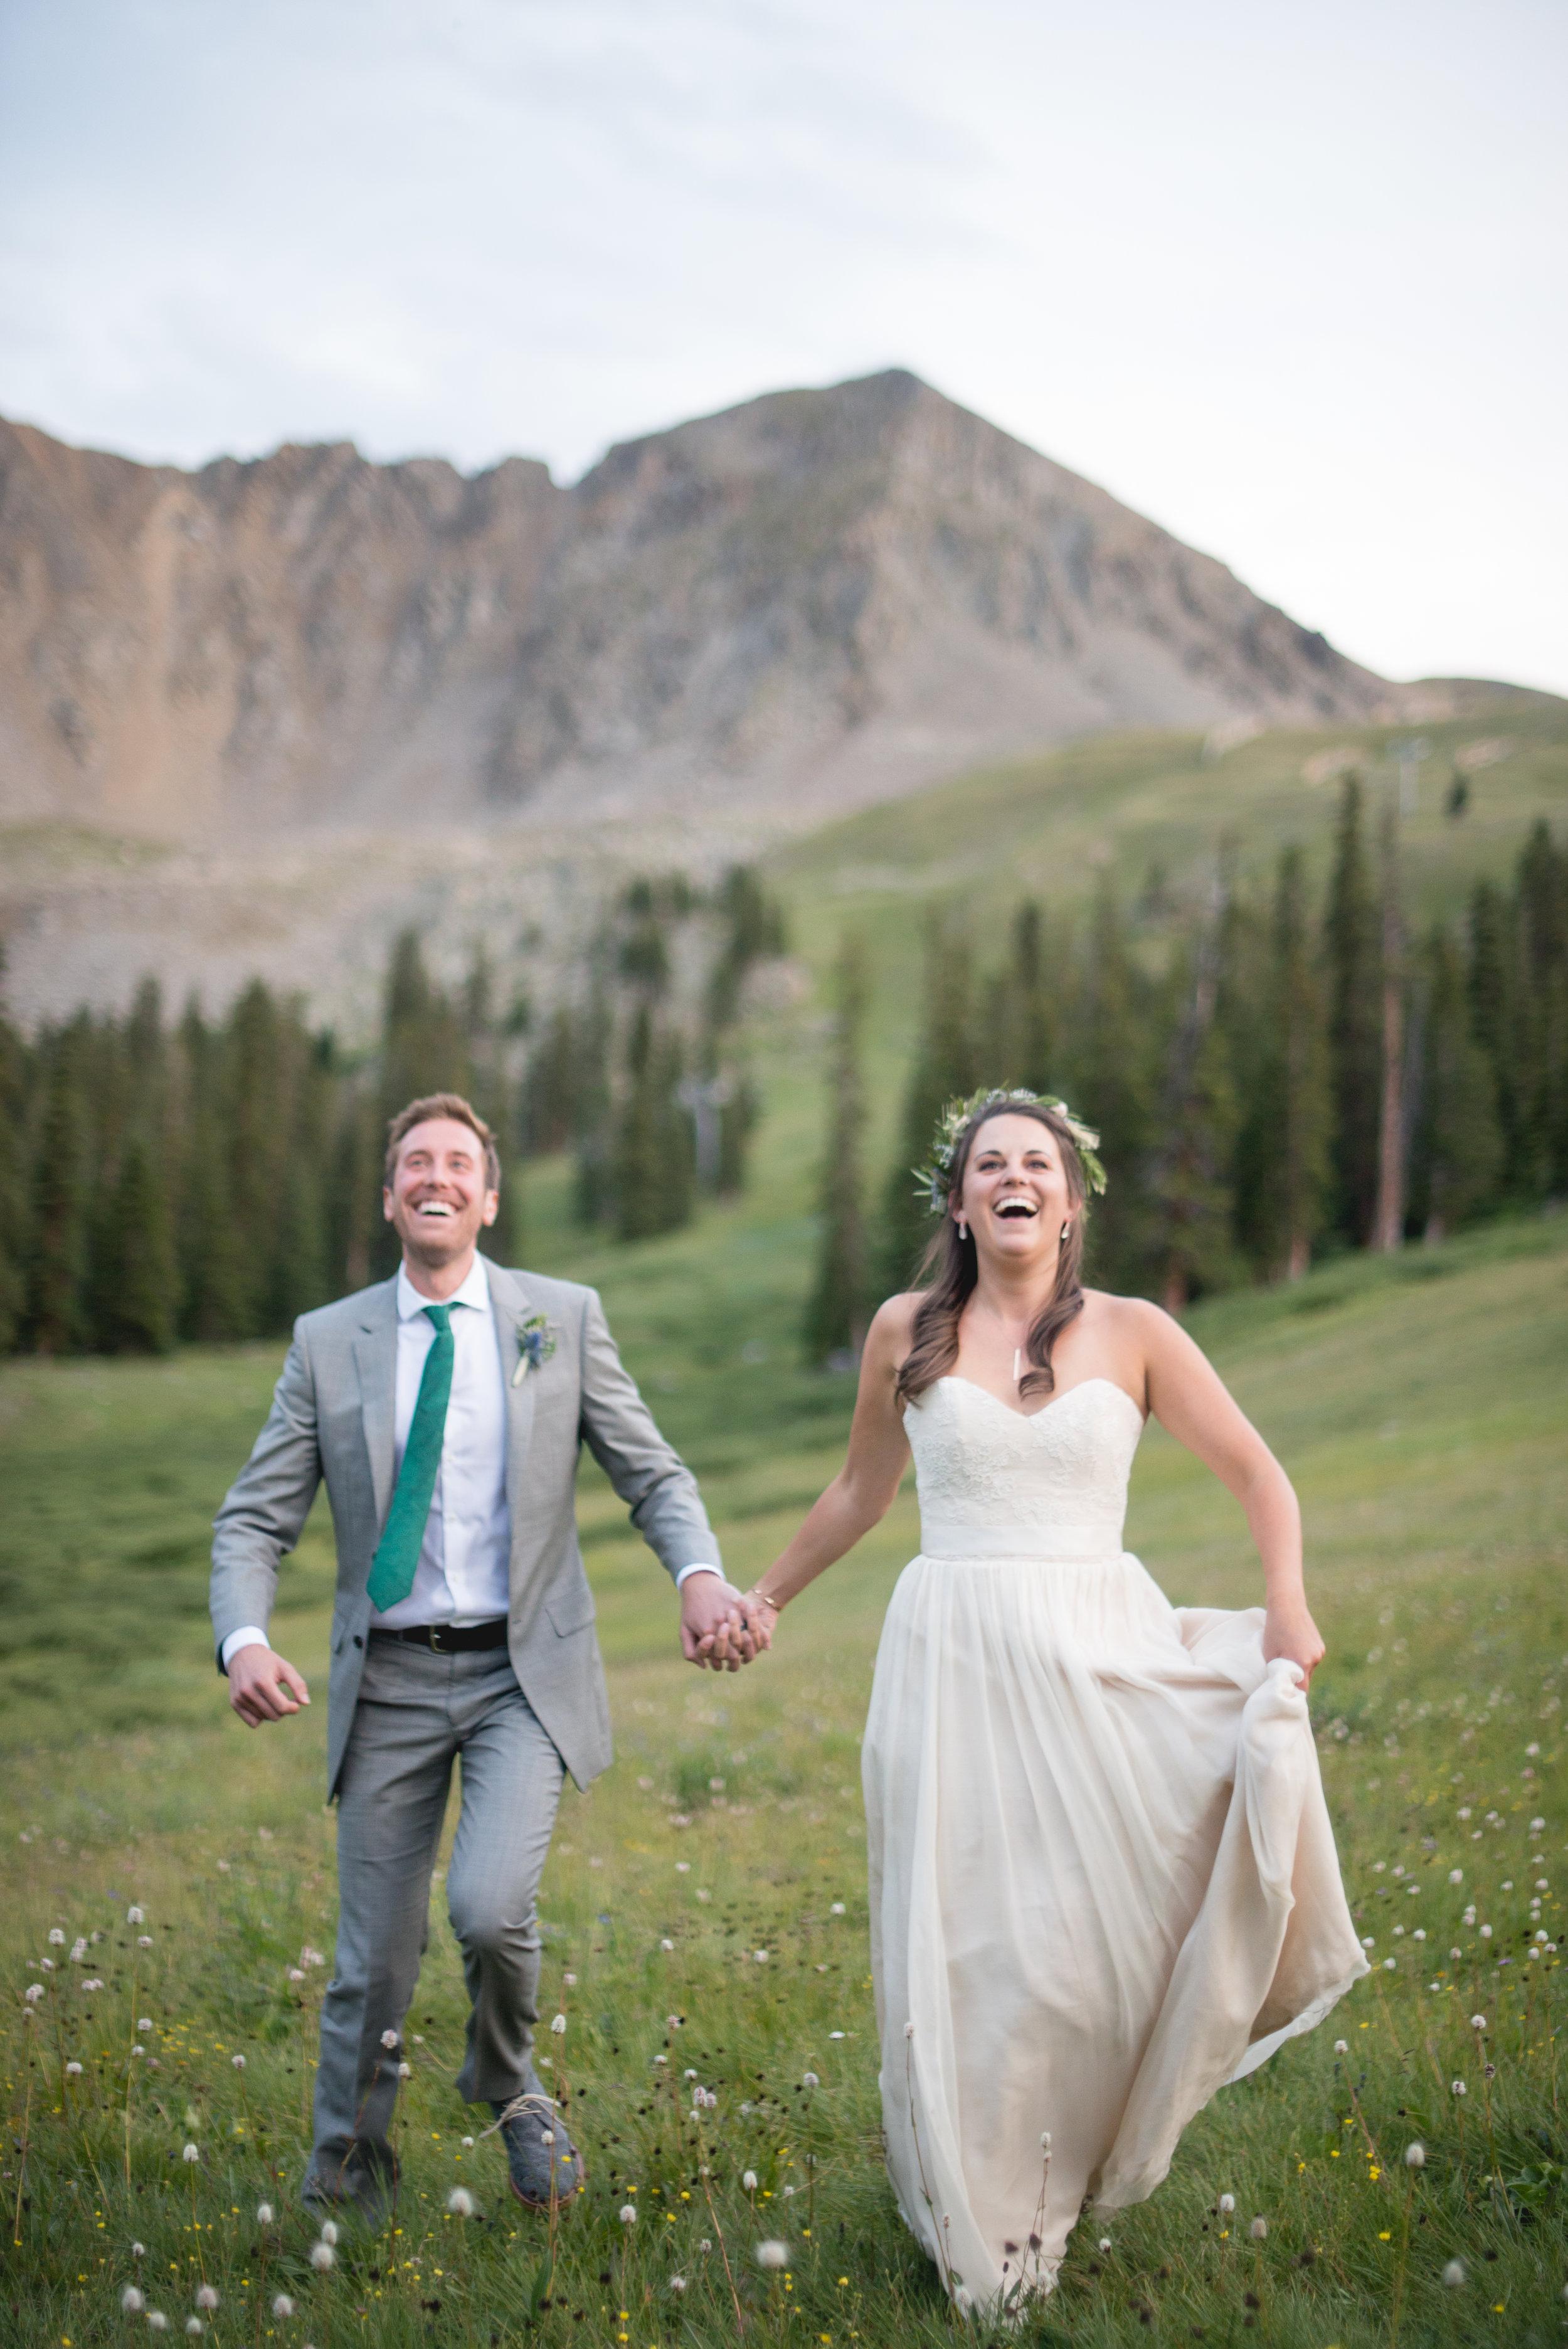 AshleighMillerWeddings-MadeleineAaron-Wedding-ArapahoeBasin-Colorado-4941.jpg